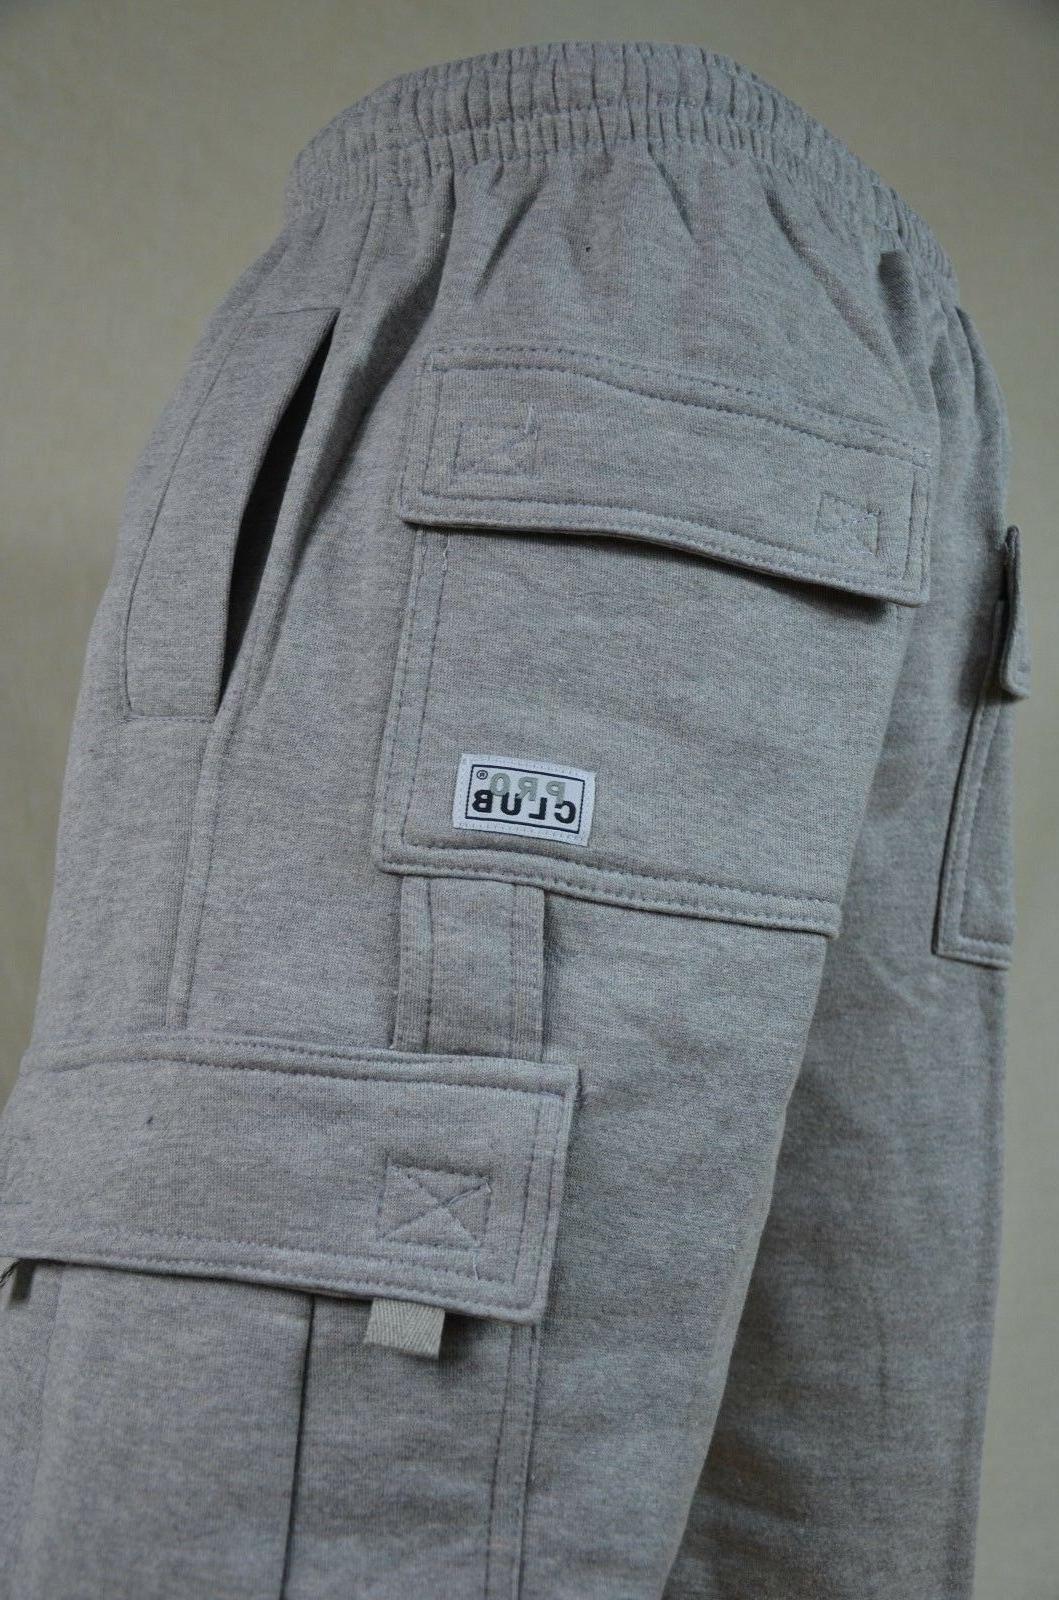 NWT Pro Club Weight Fleece Cargo Mens Sweatpants